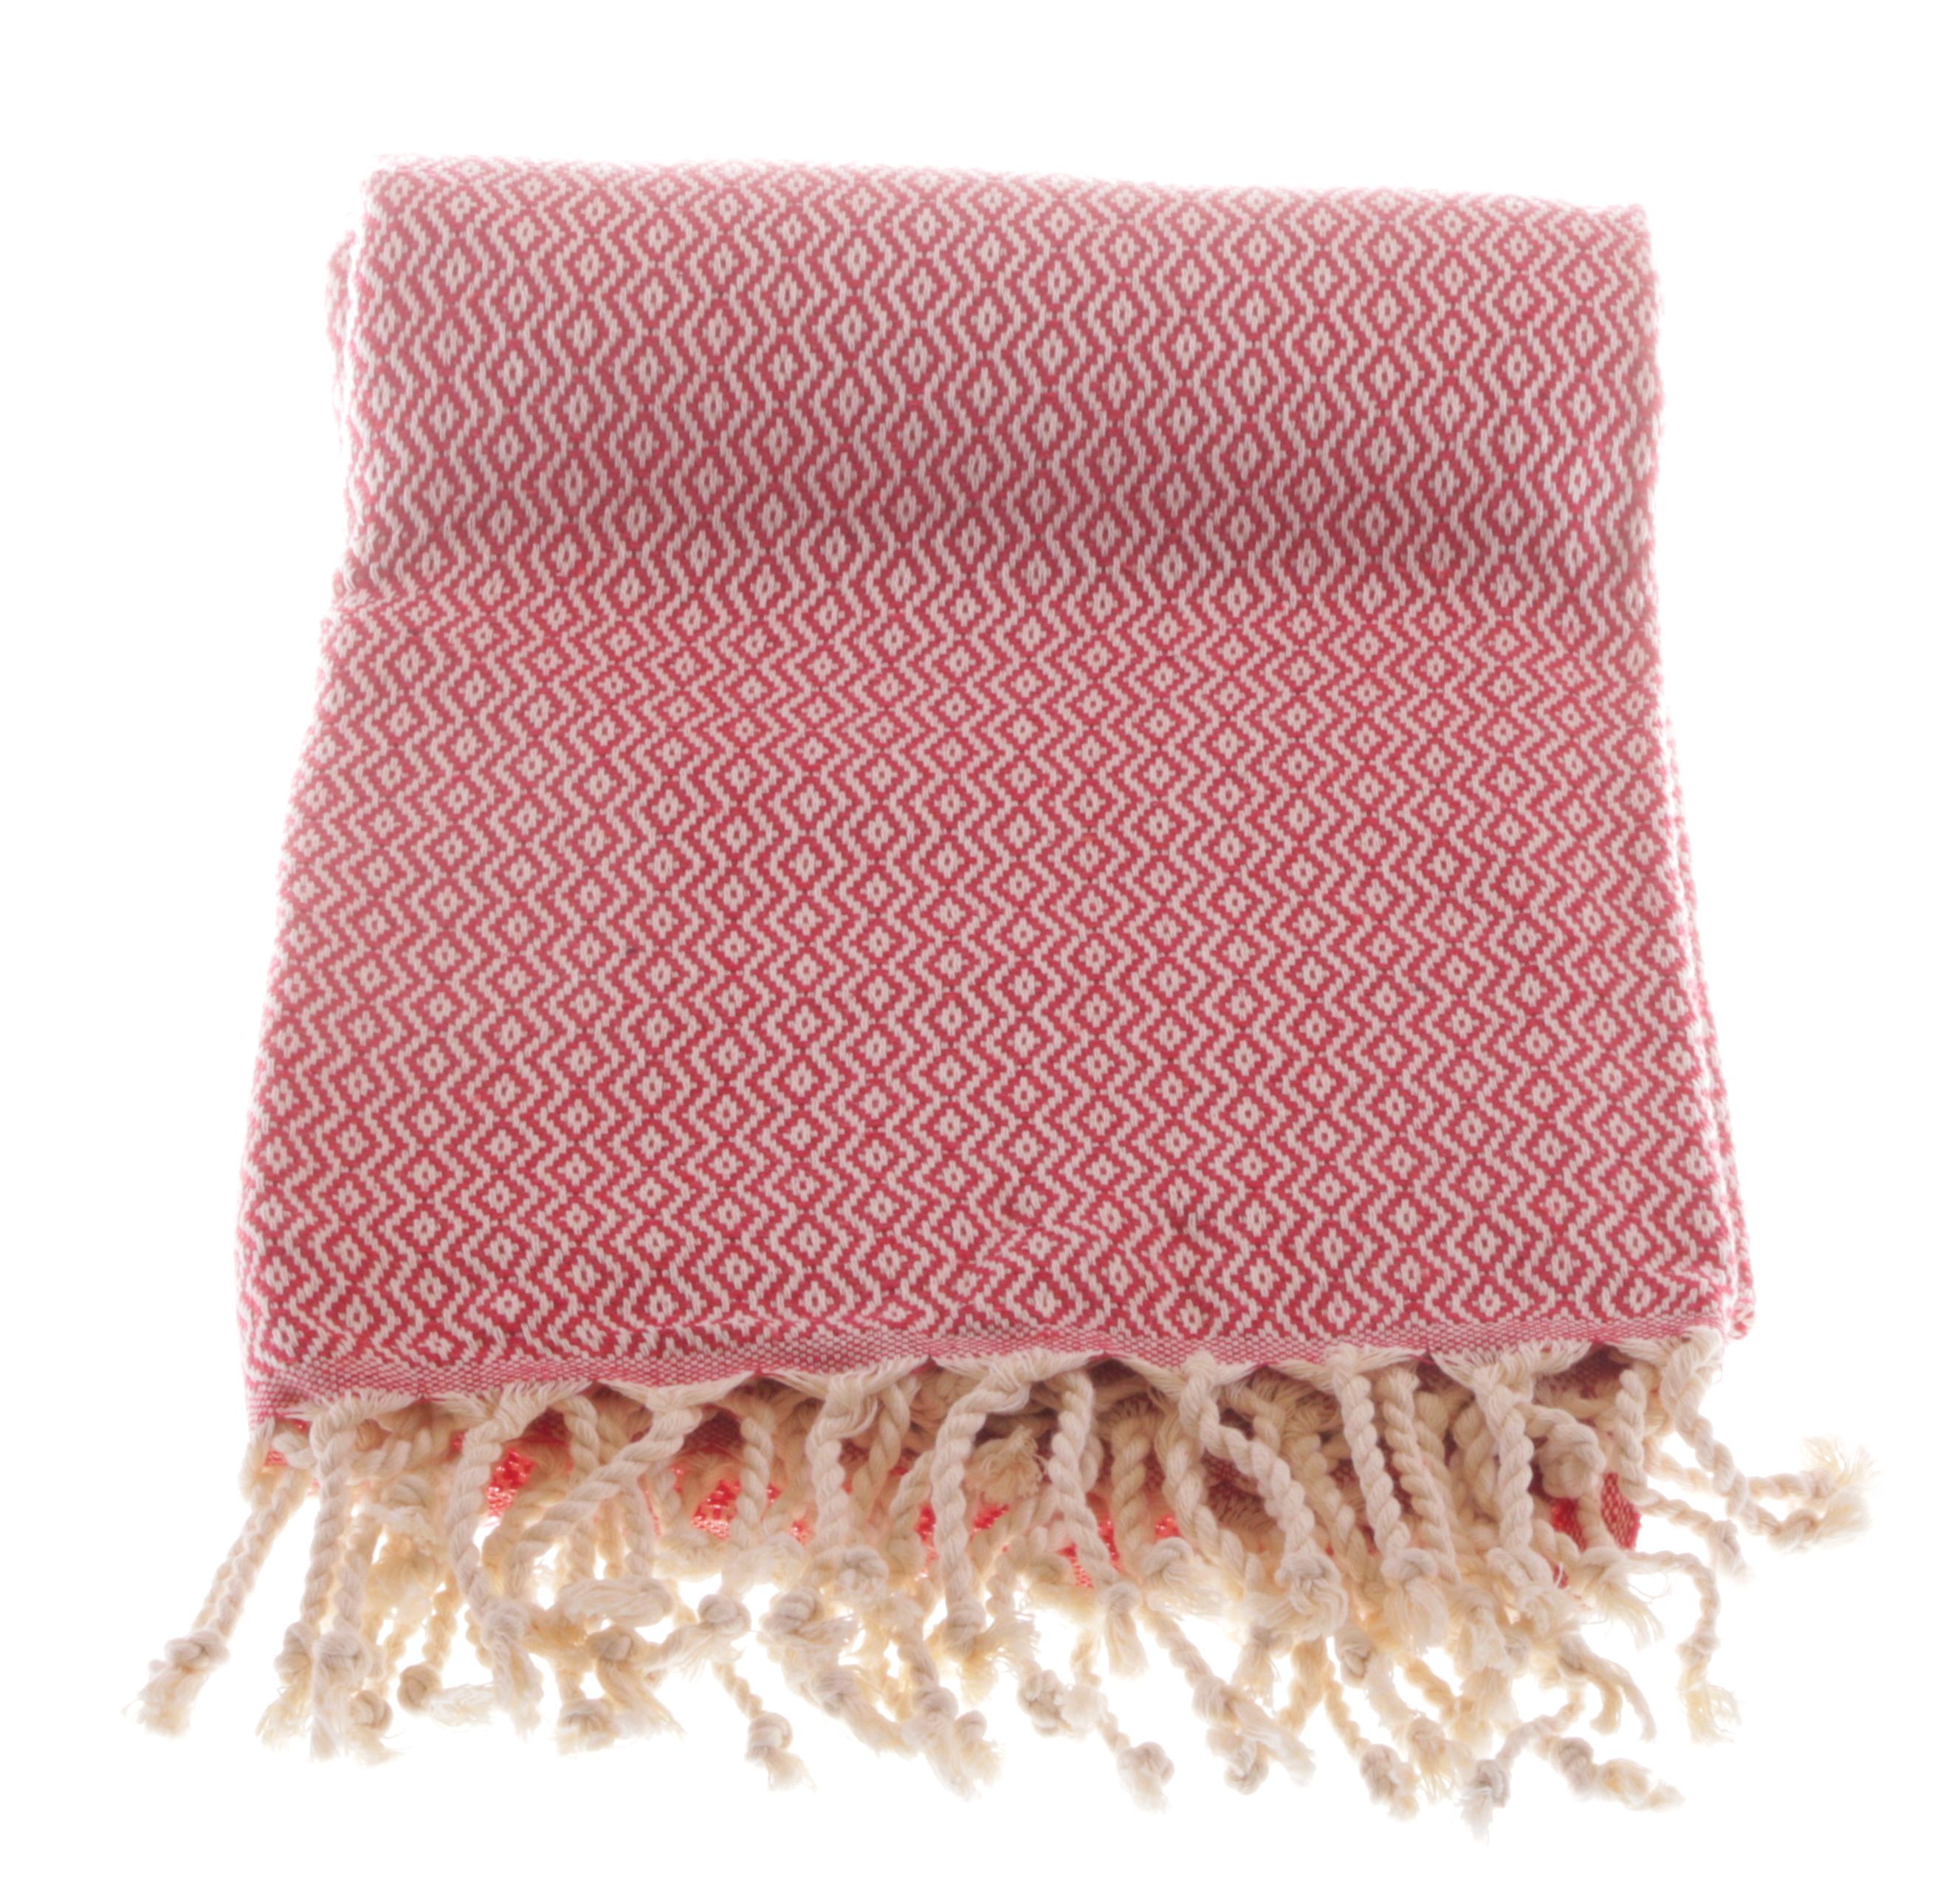 cotton-hammam-towel-kelim2-red